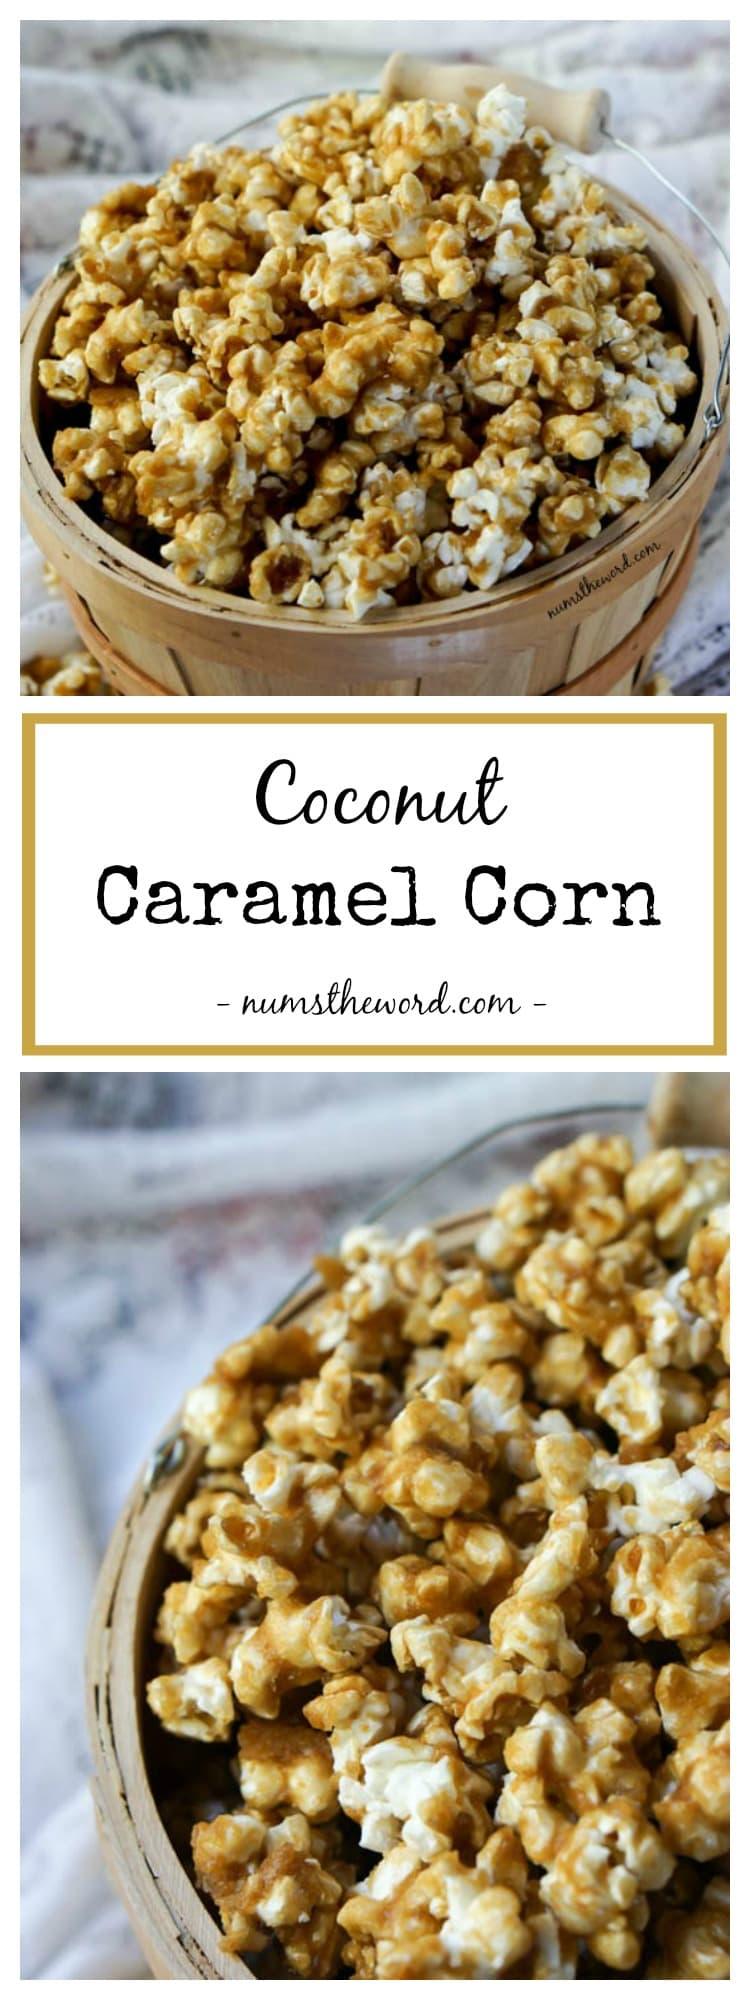 Coconut Caramel Corn